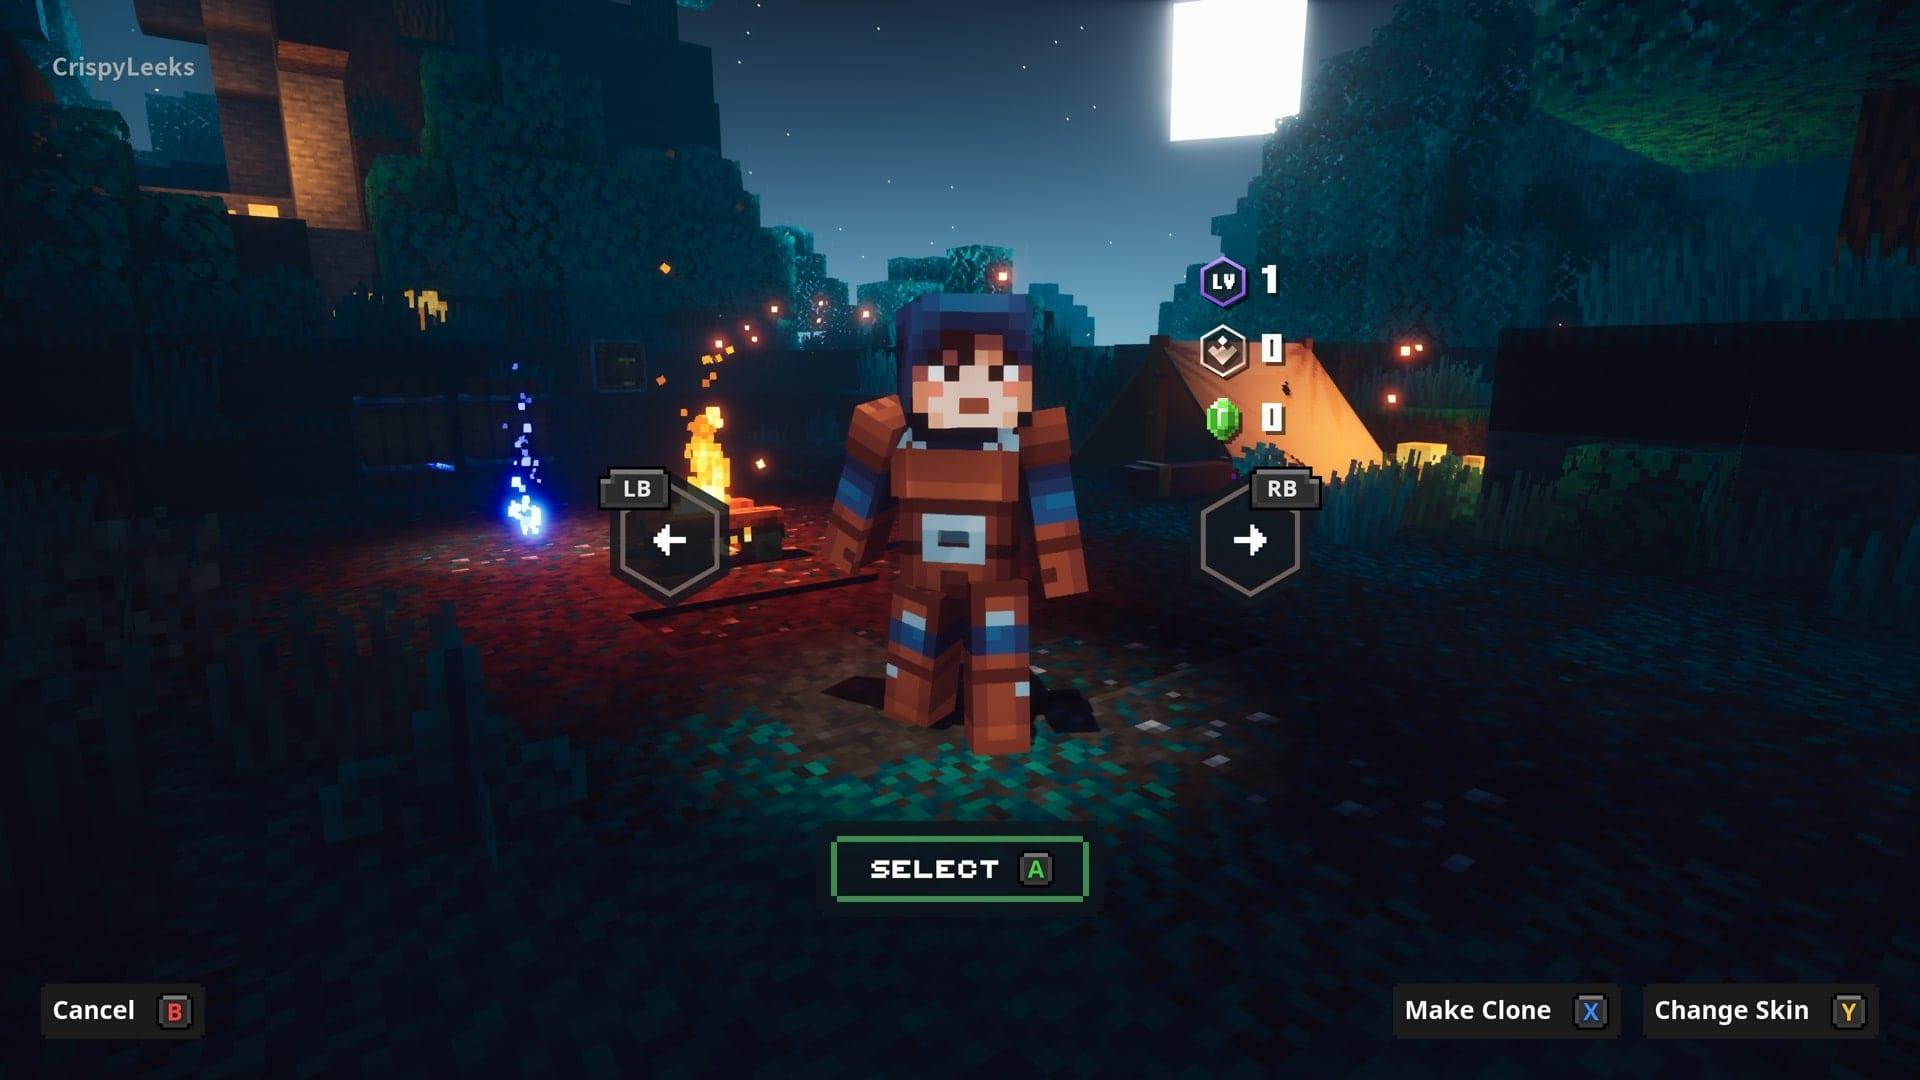 mazmorras de minecraft skins personalizadas